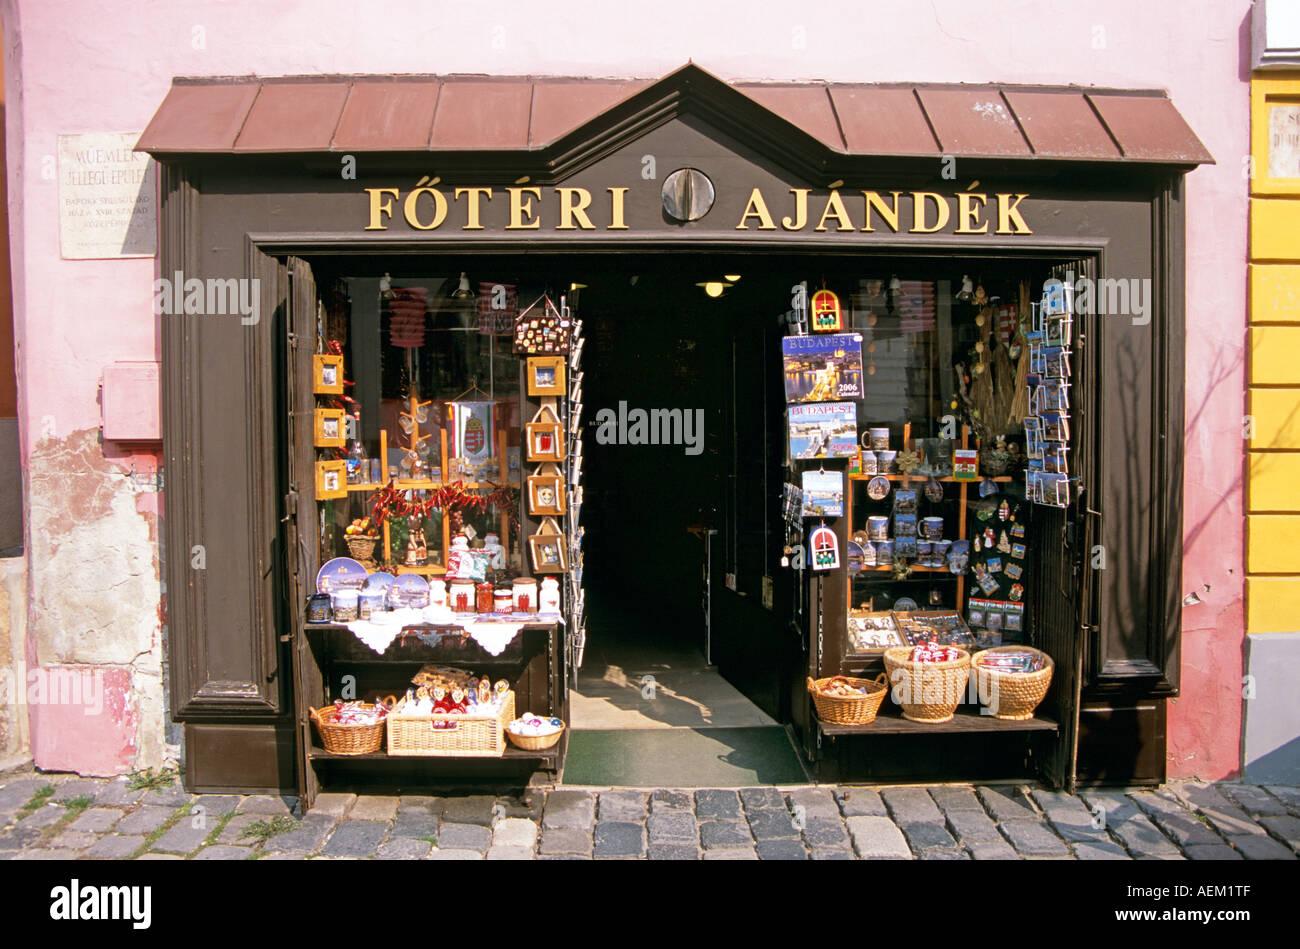 Foteri Ajandek gift and craft shop, Szentendre, Hungary - Stock Image